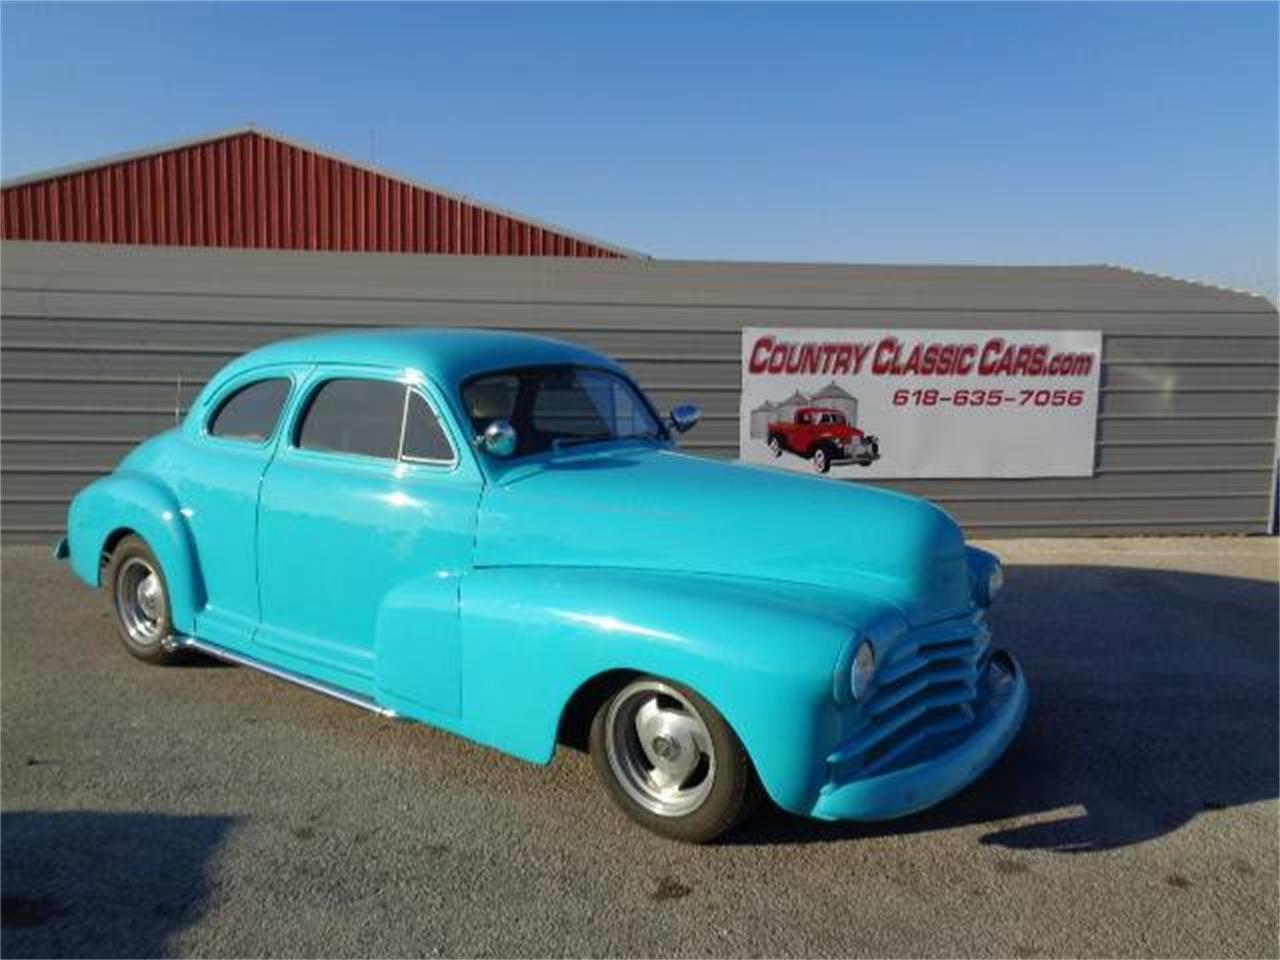 For Sale 1947 Chevrolet Coupe In Staunton Illinois